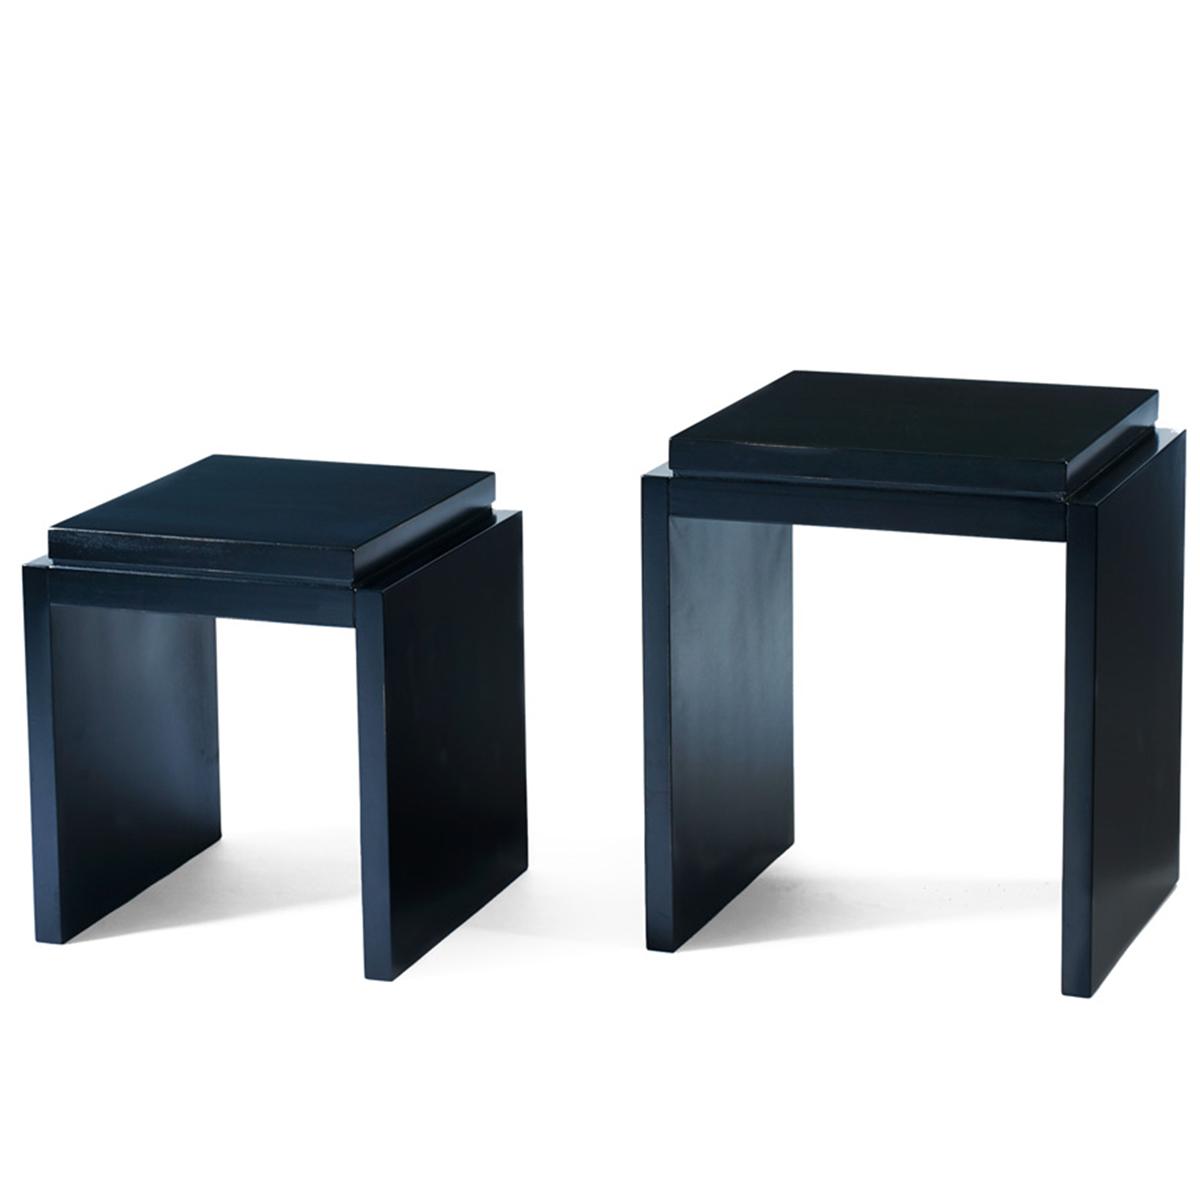 Oliver-Nesting-Tables_For-Web.jpg